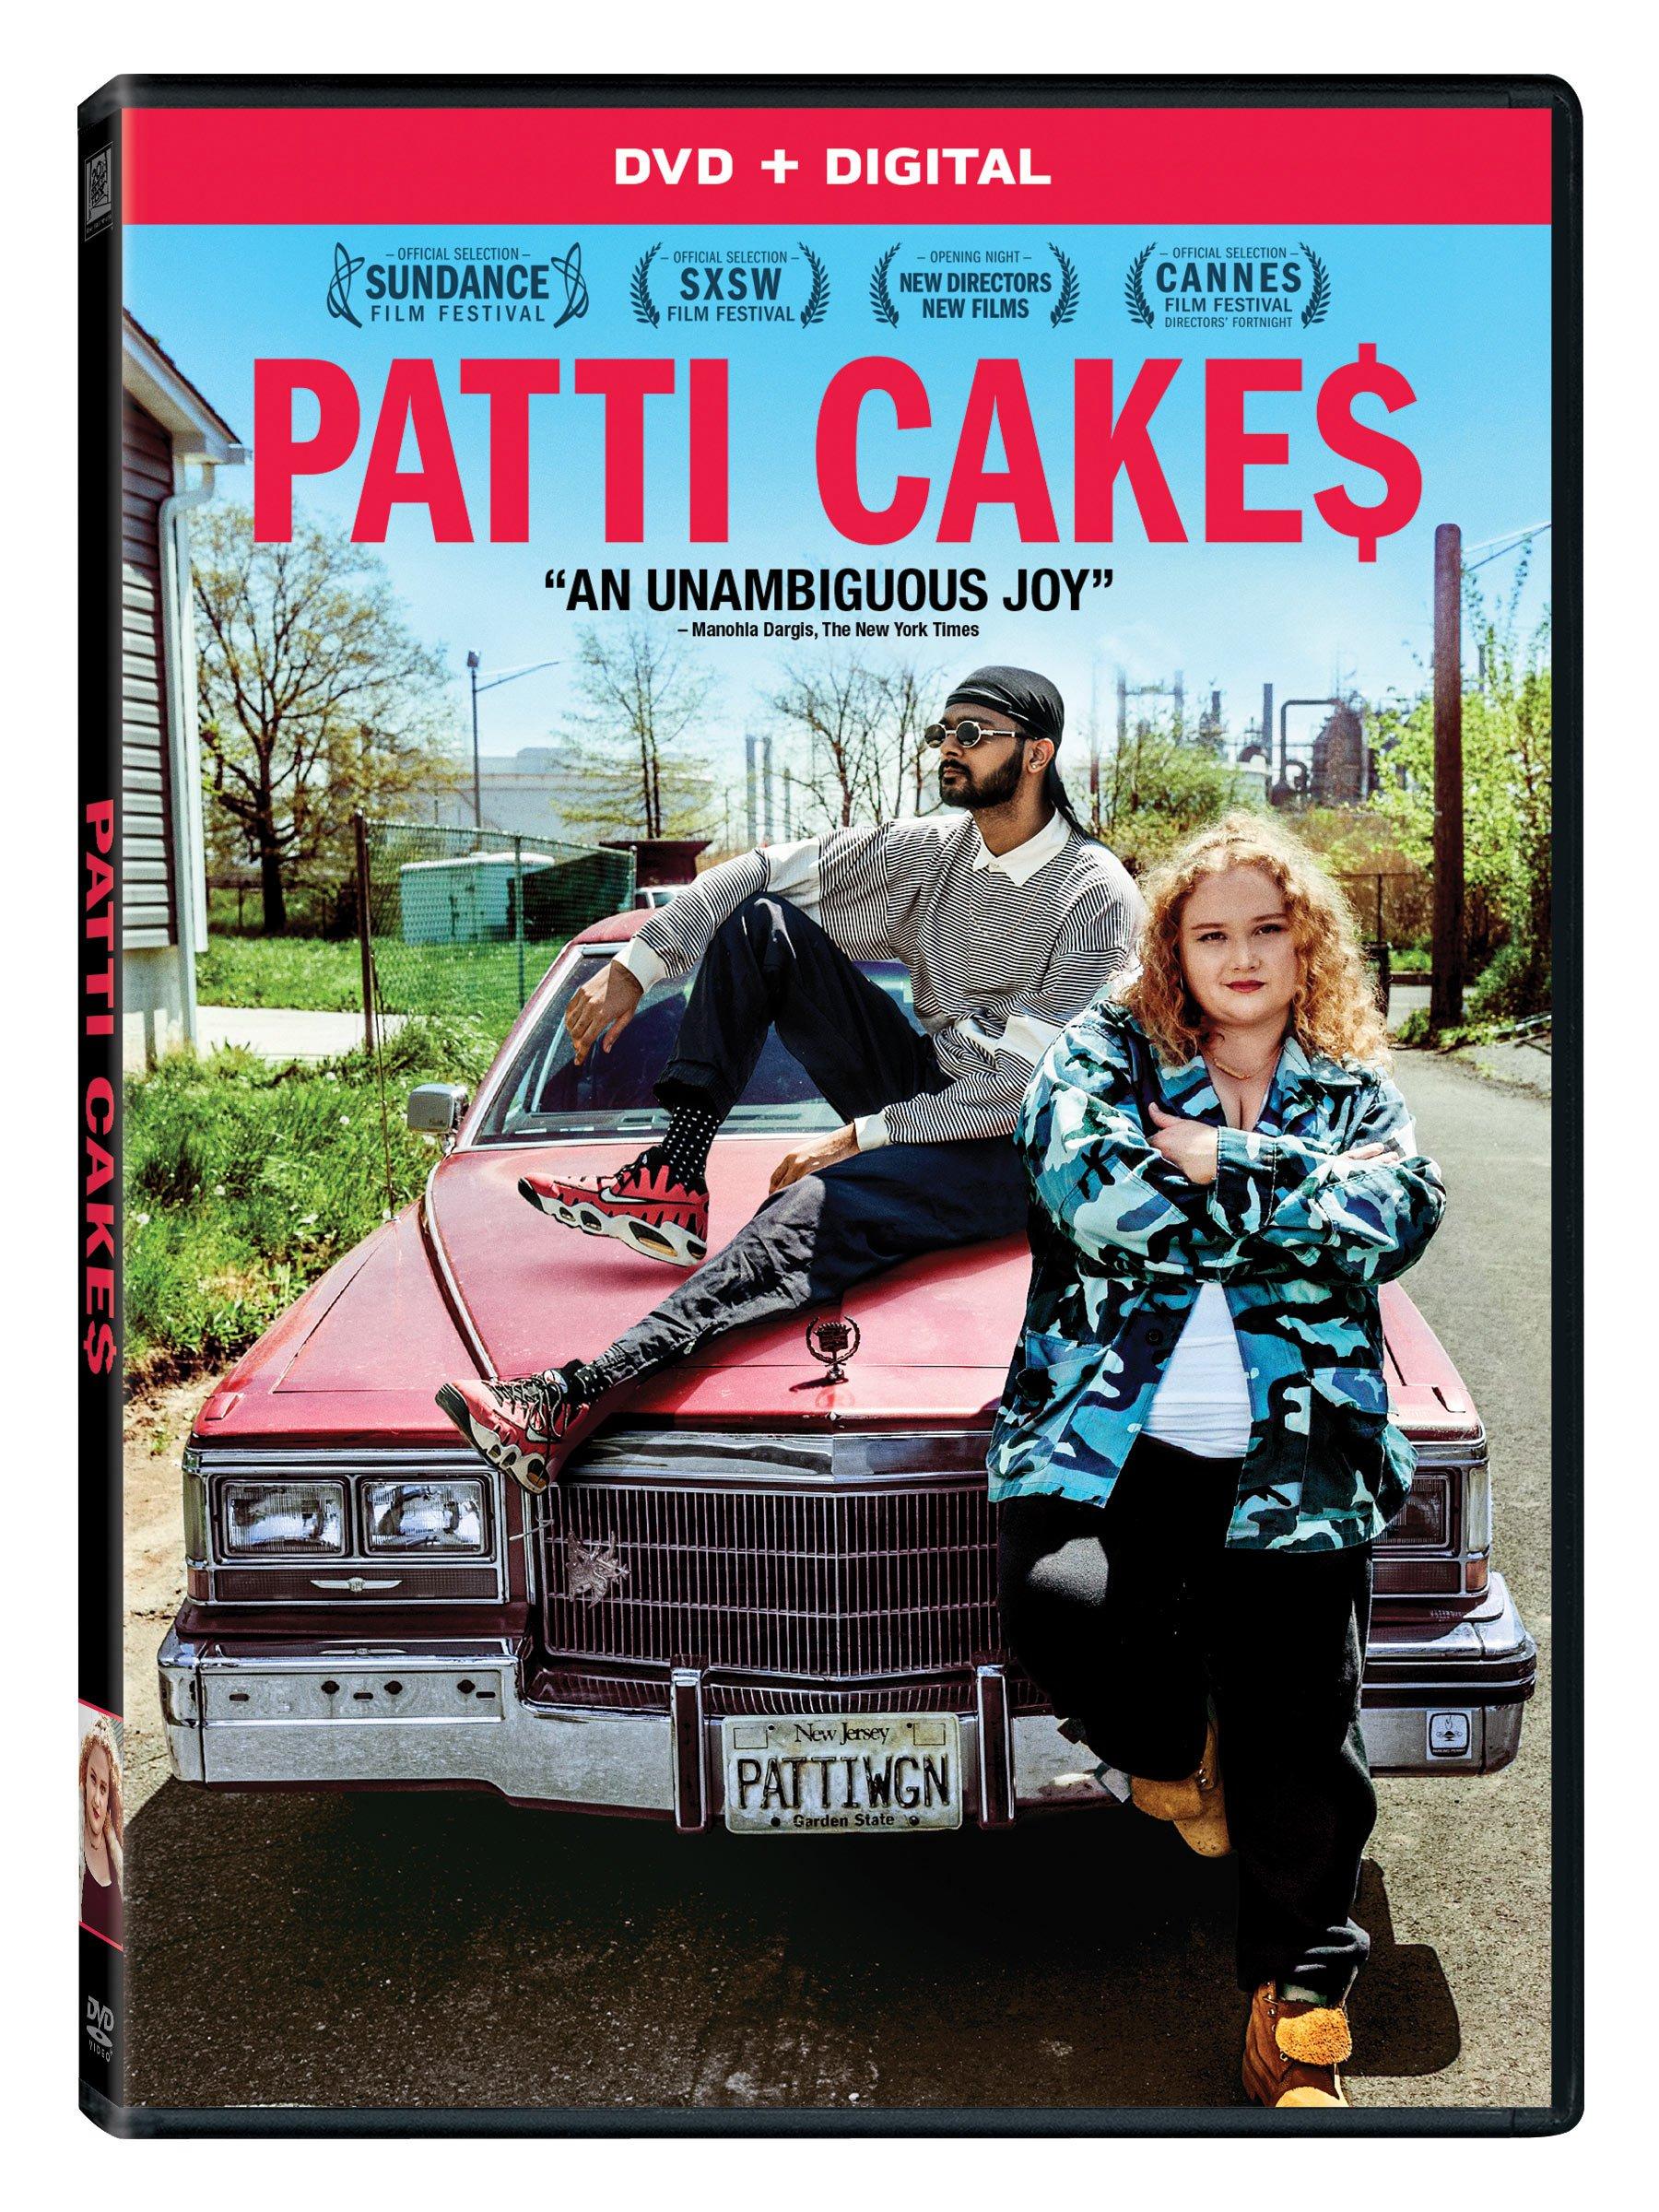 DVD : Patti Cake$ (Digitally Mastered in HD)